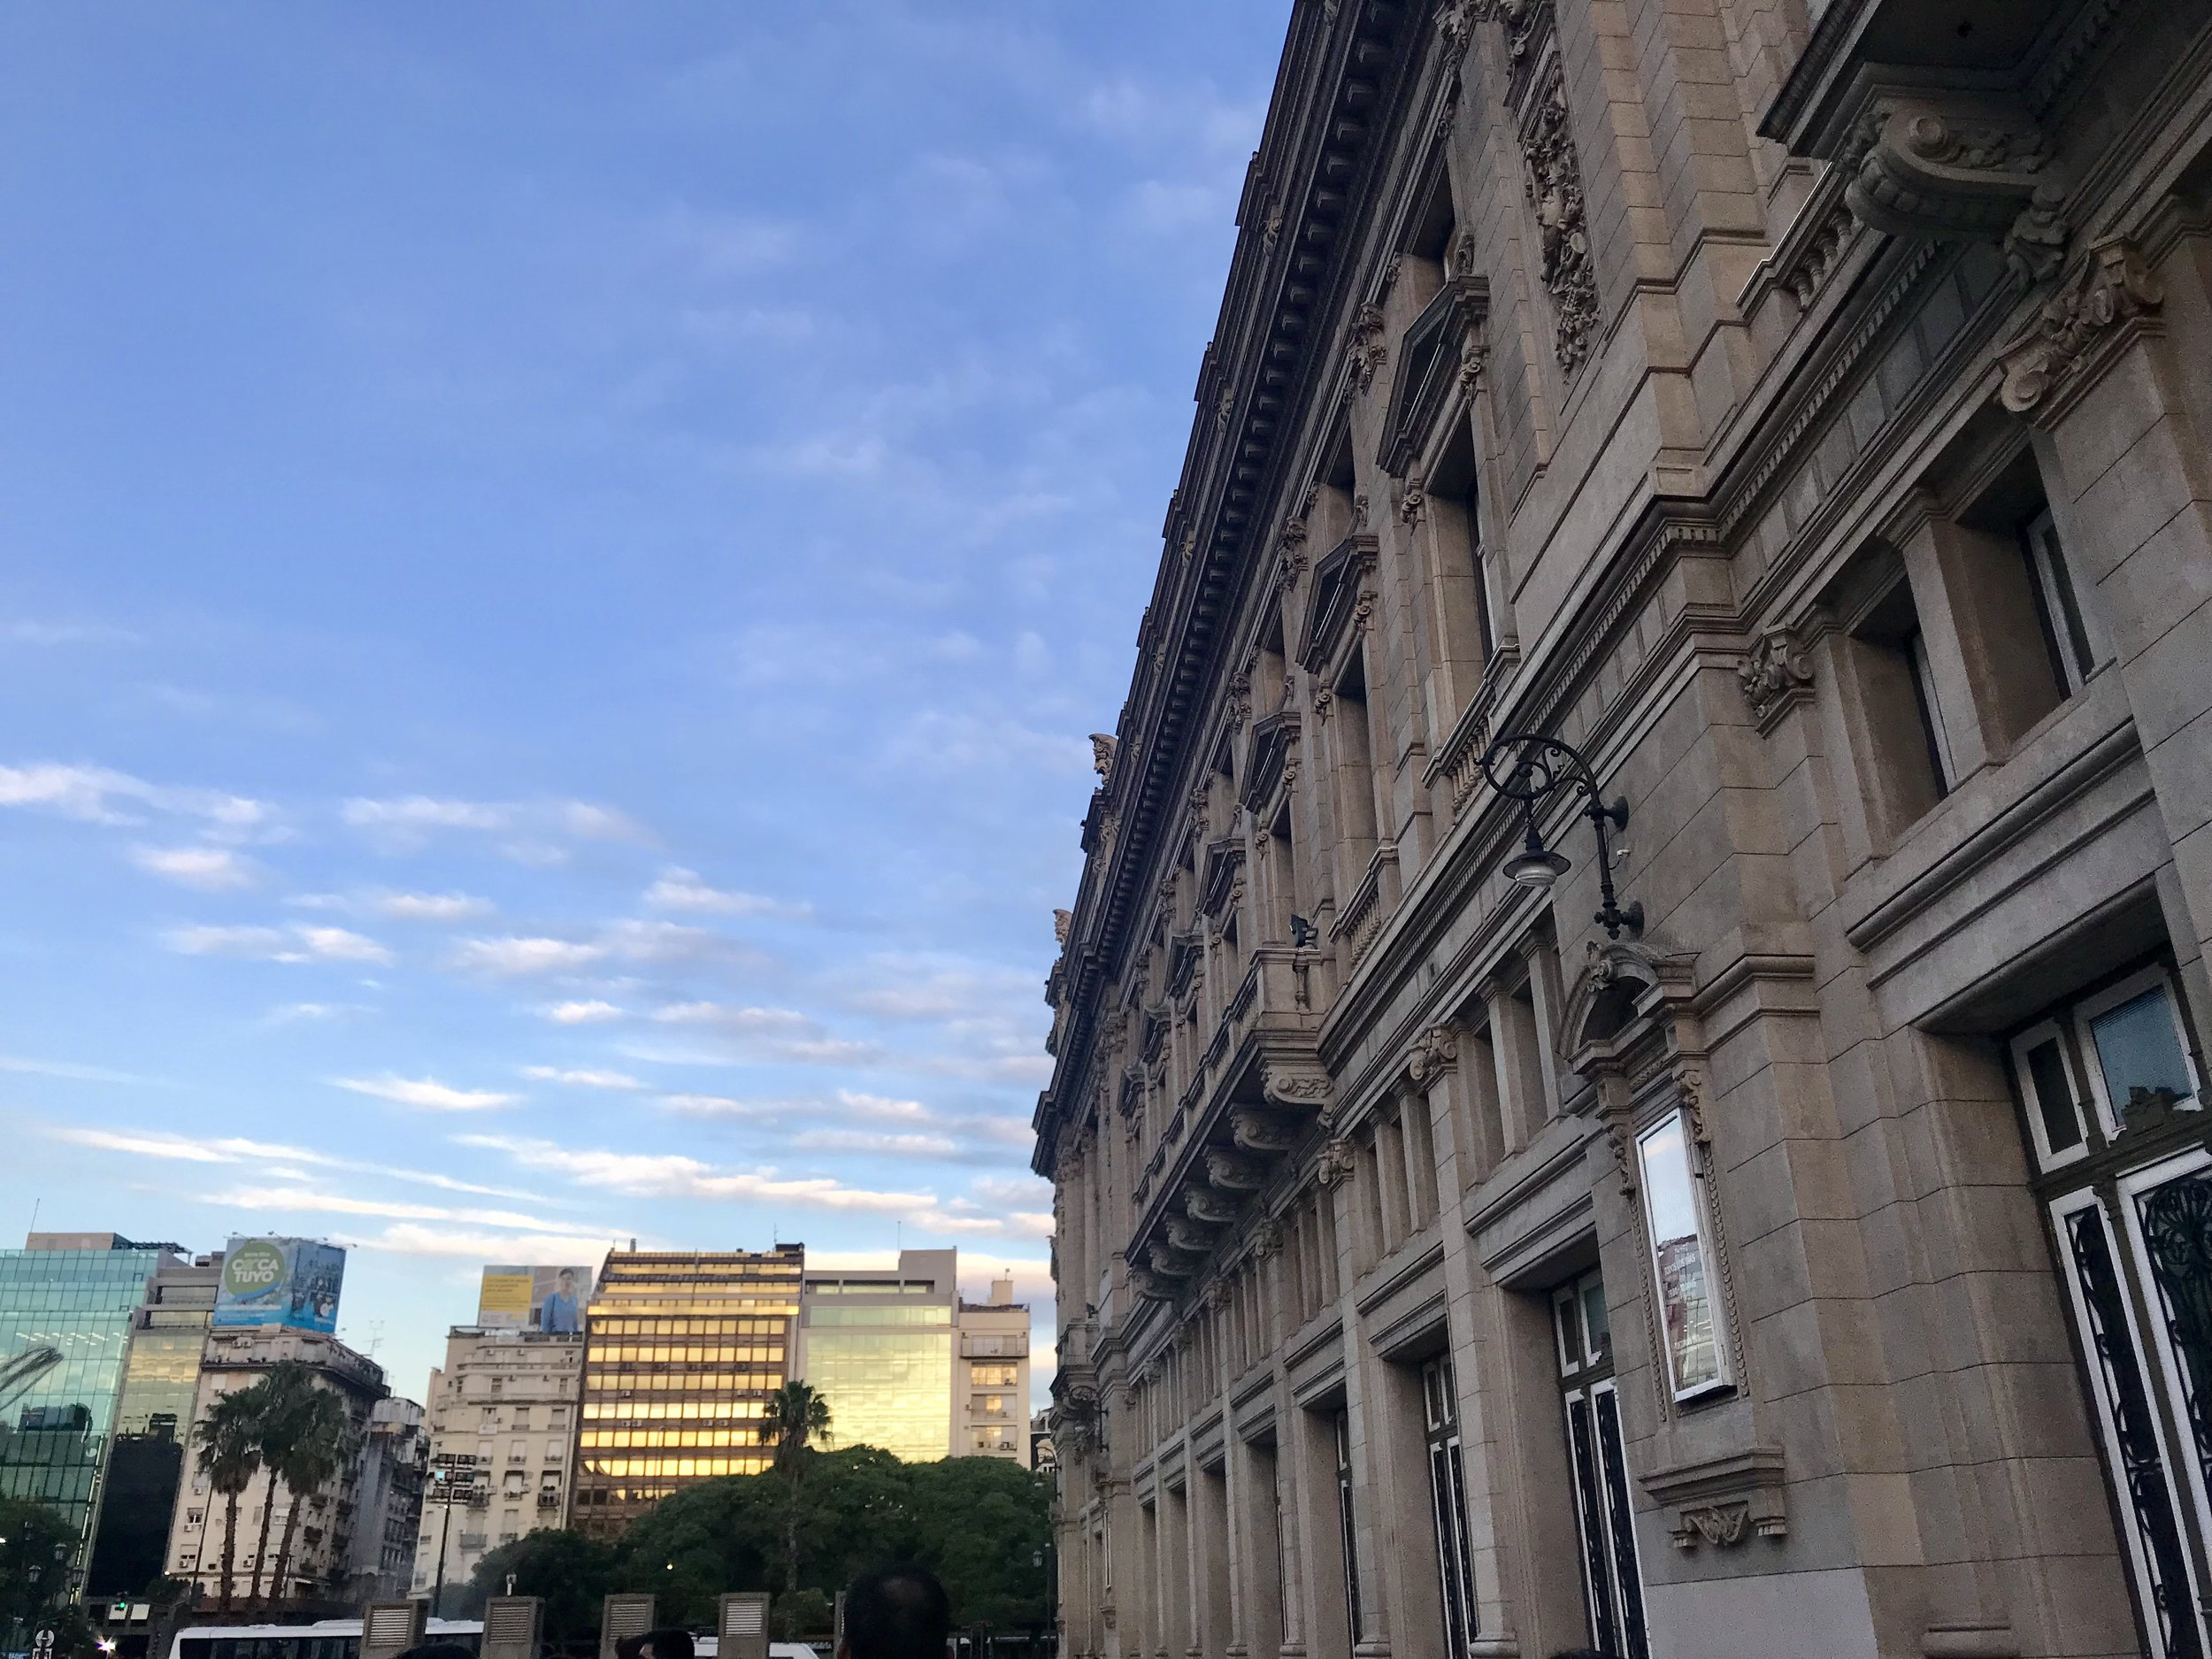 Teatro Colón Buenos Aires - Frassaï